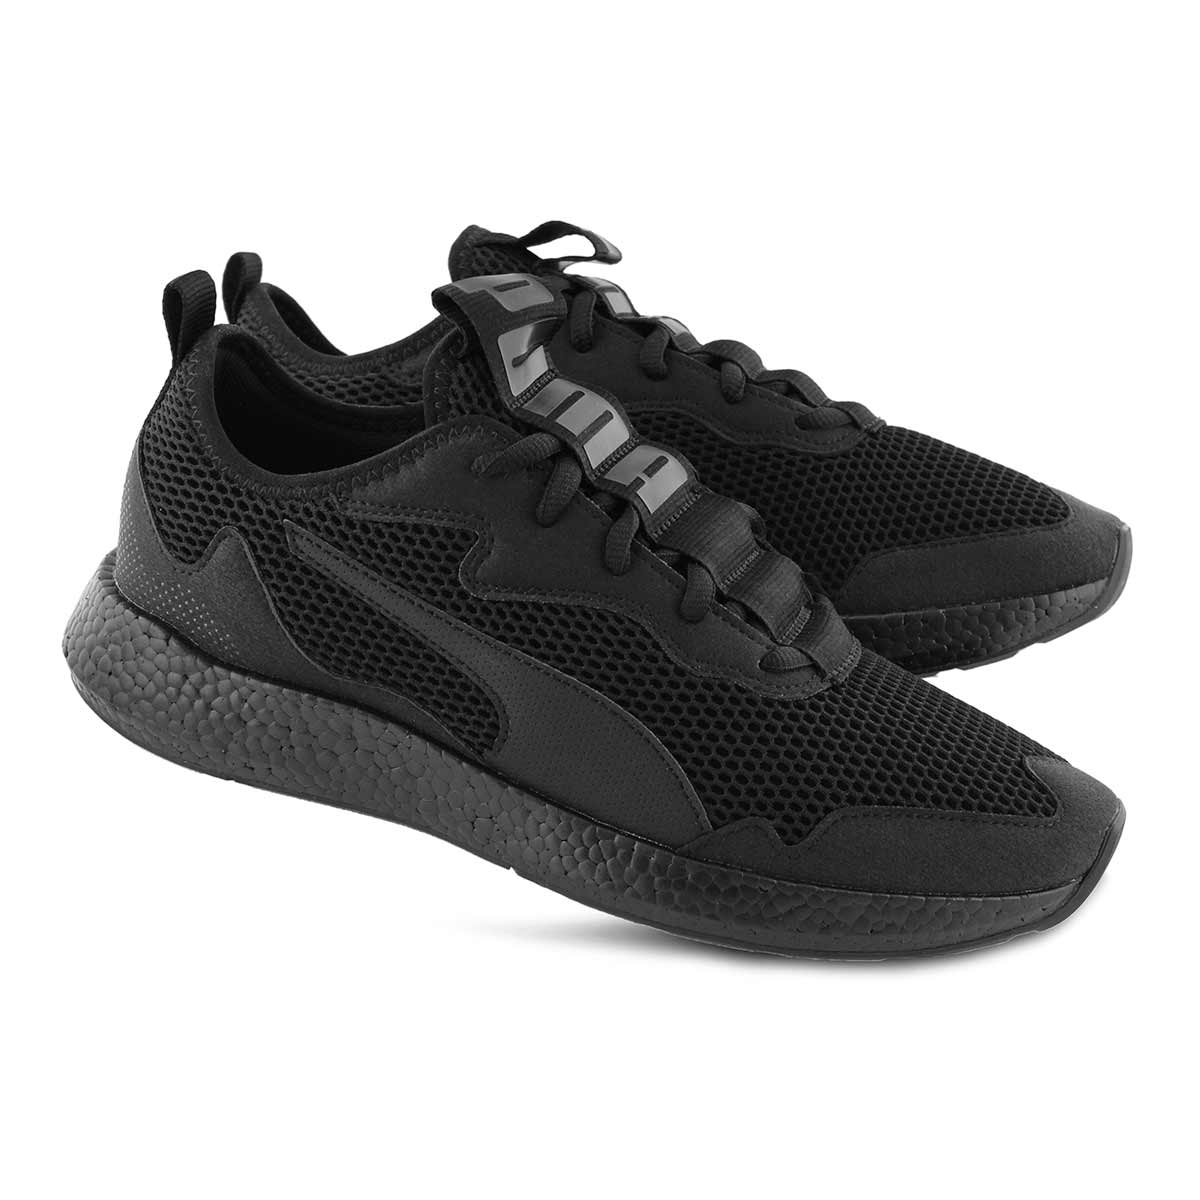 NRGY Neko Skim Puma Black-Puma Black